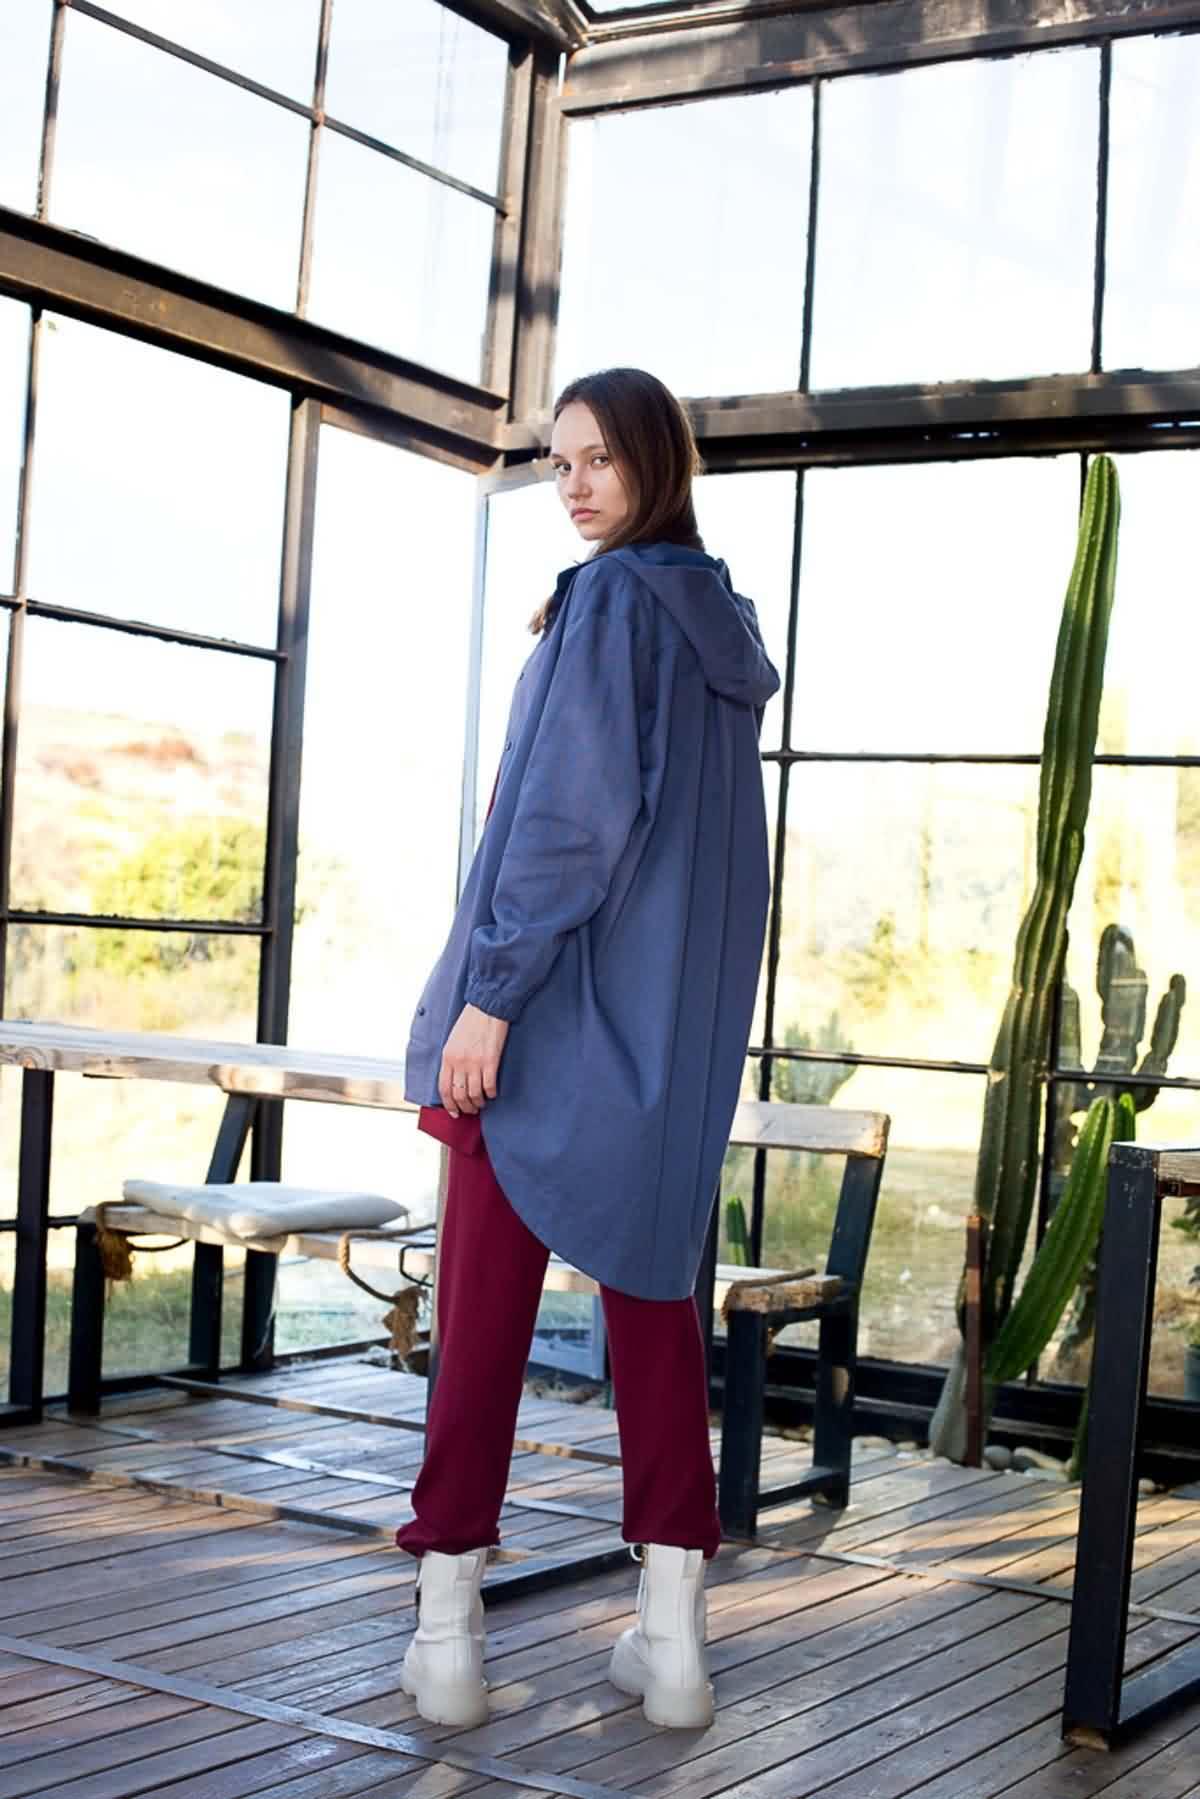 Mevra - Kapüşonlu Ceket İndigo